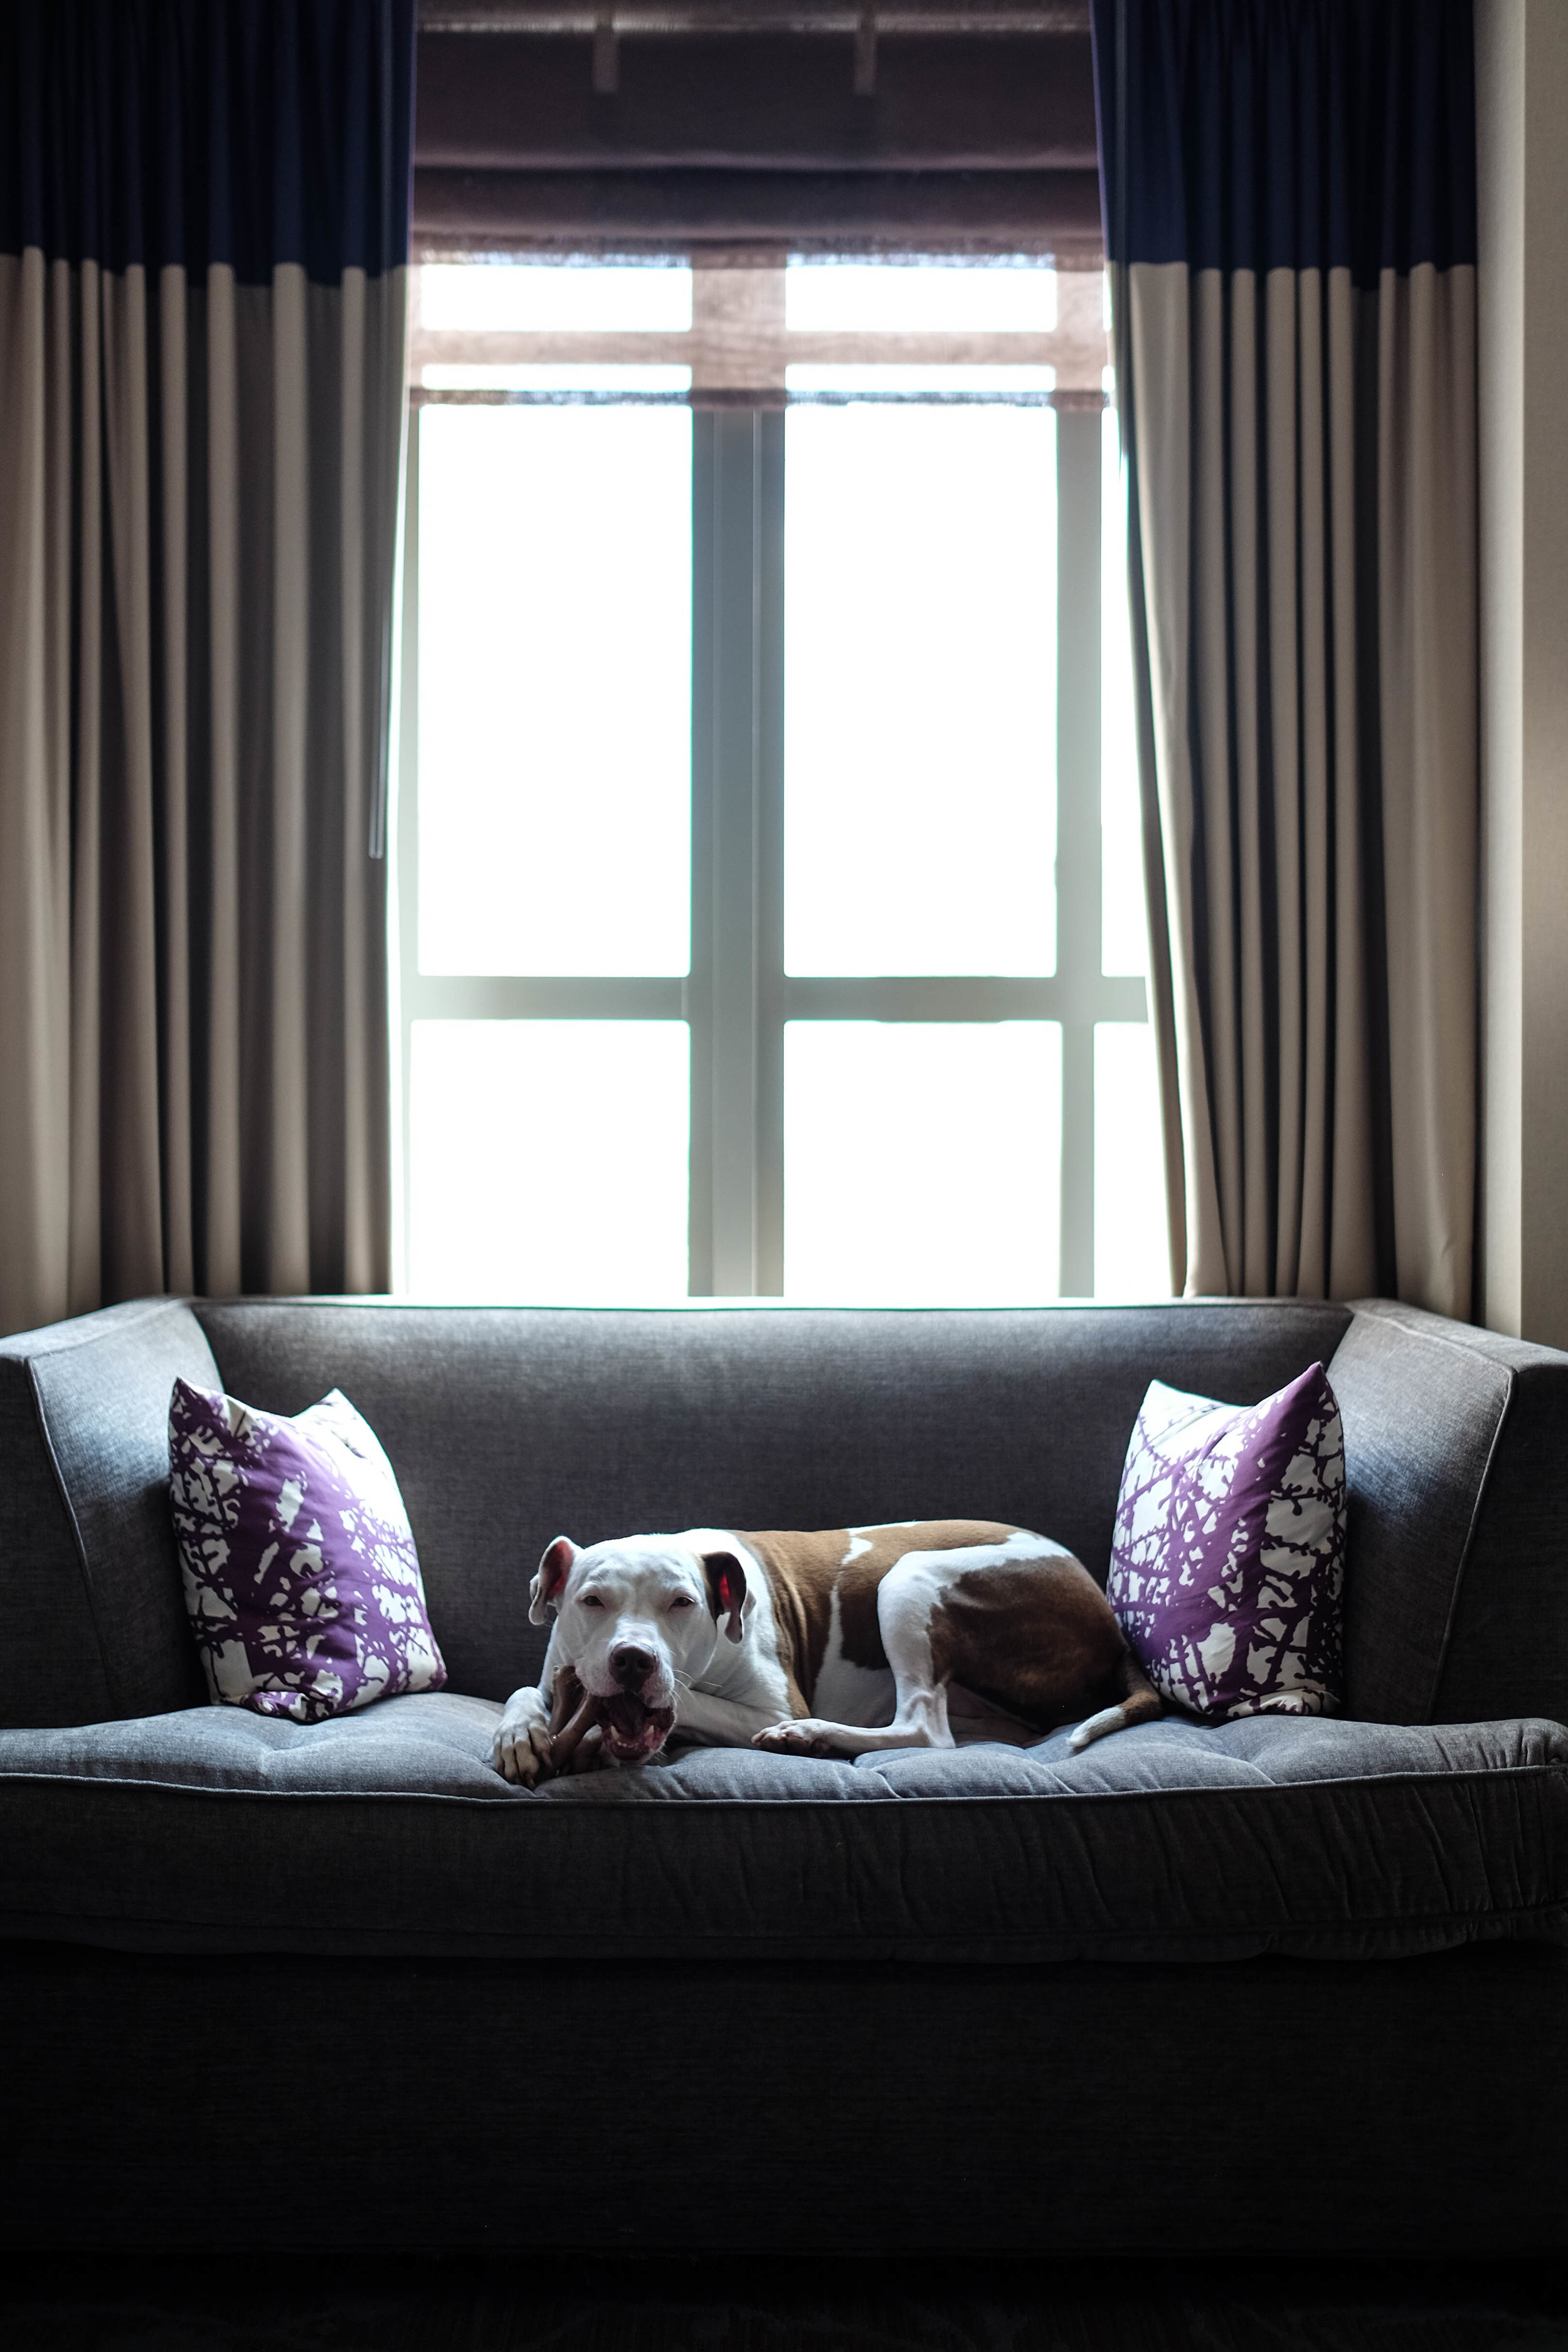 Kimpton_Hotel_Philadelphia_Dog_Friendly_Photographer_Kristen_Humbert-7694.jpg